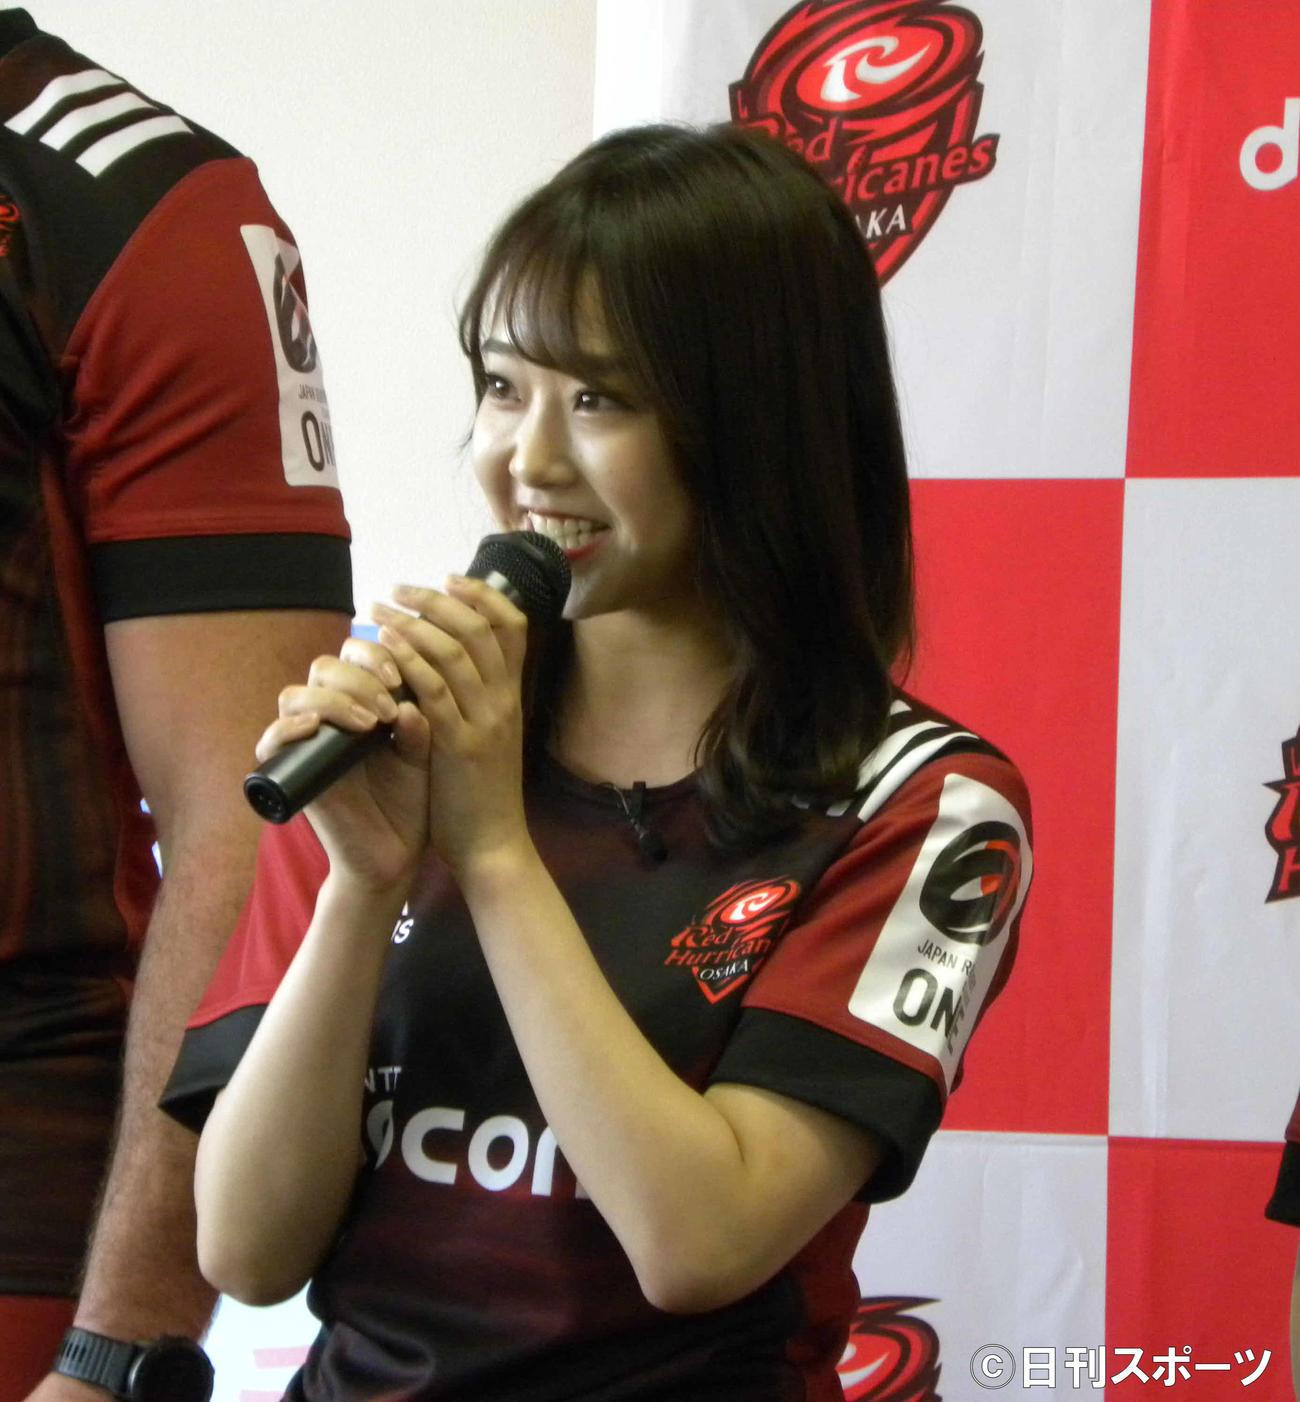 NTTドコモレッドハリケーンズ大阪の公式アンバサダー就任式で思いを語るNMB48の加藤夕夏(撮影・松本航)